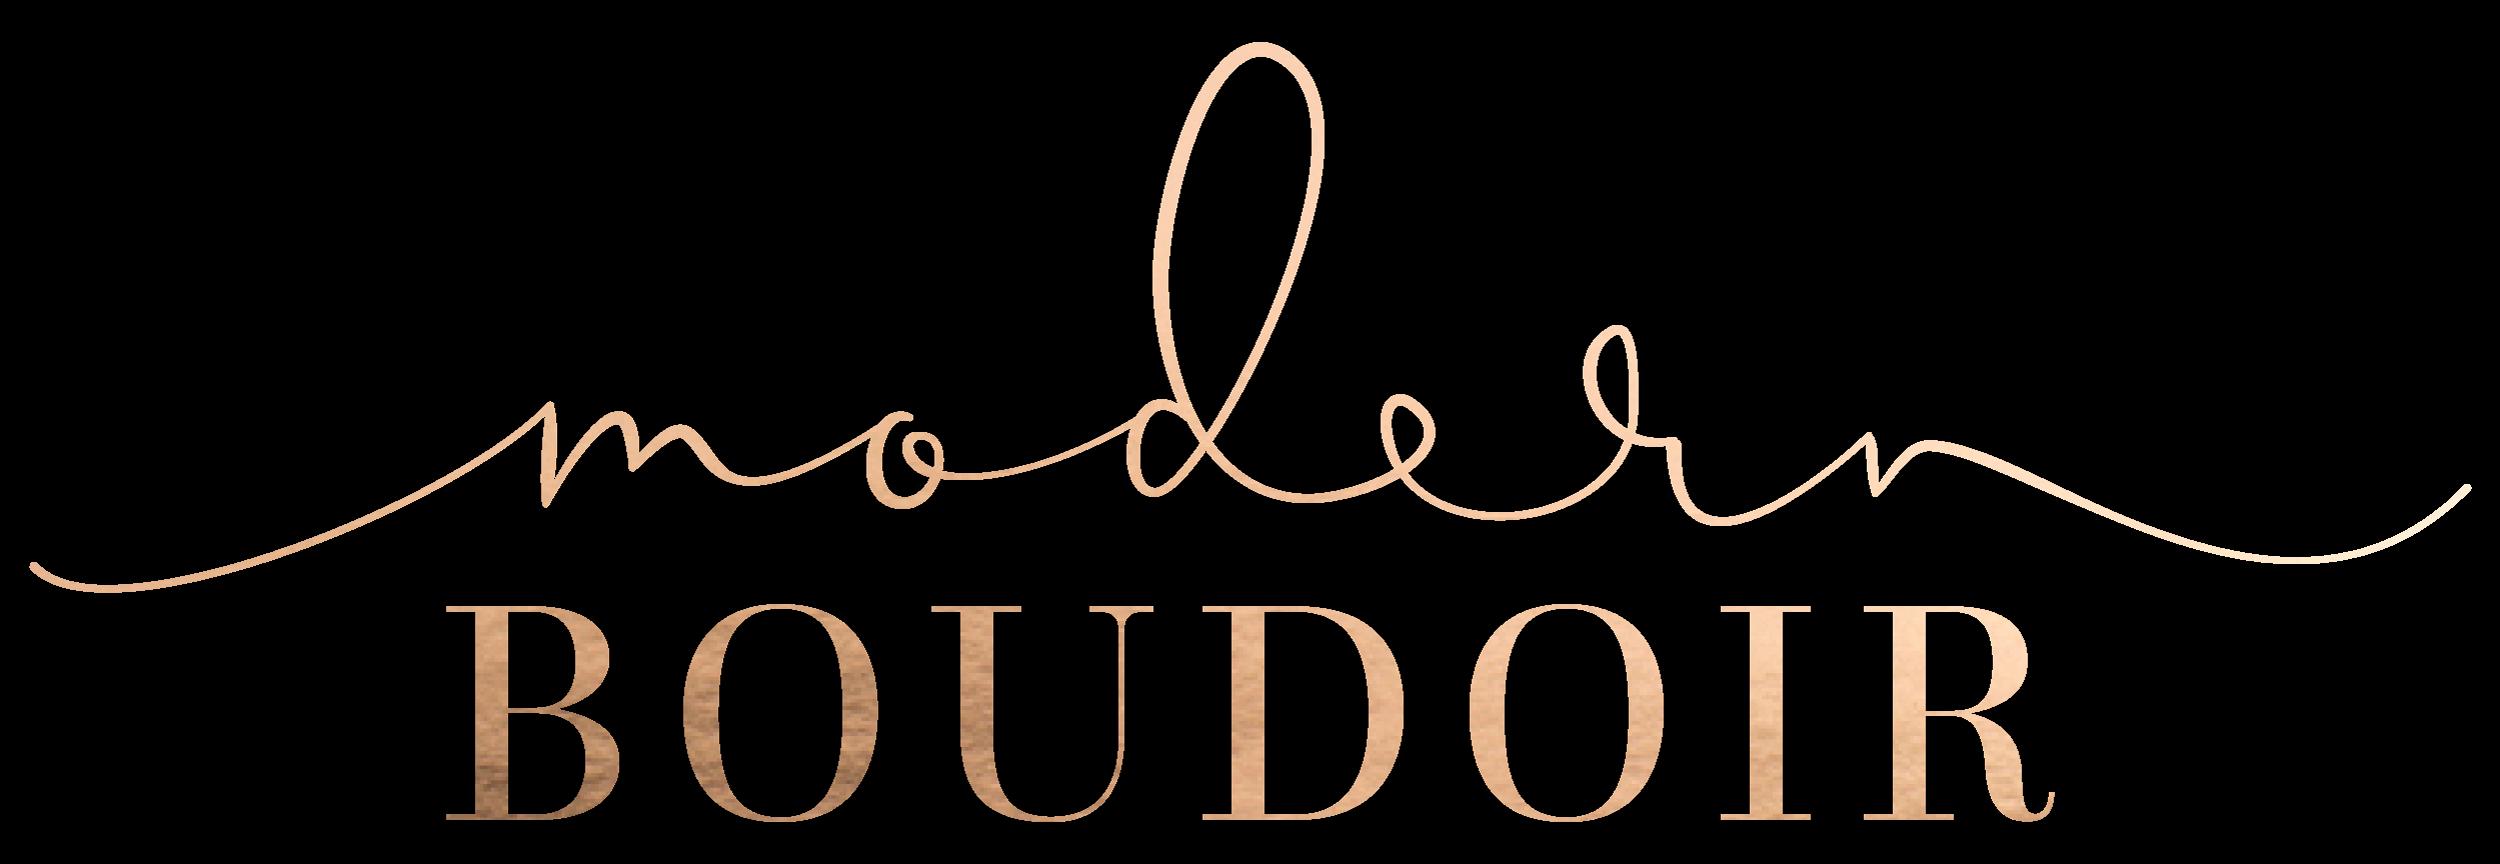 Modern Boudoir - Iowa boudoir photography for all women